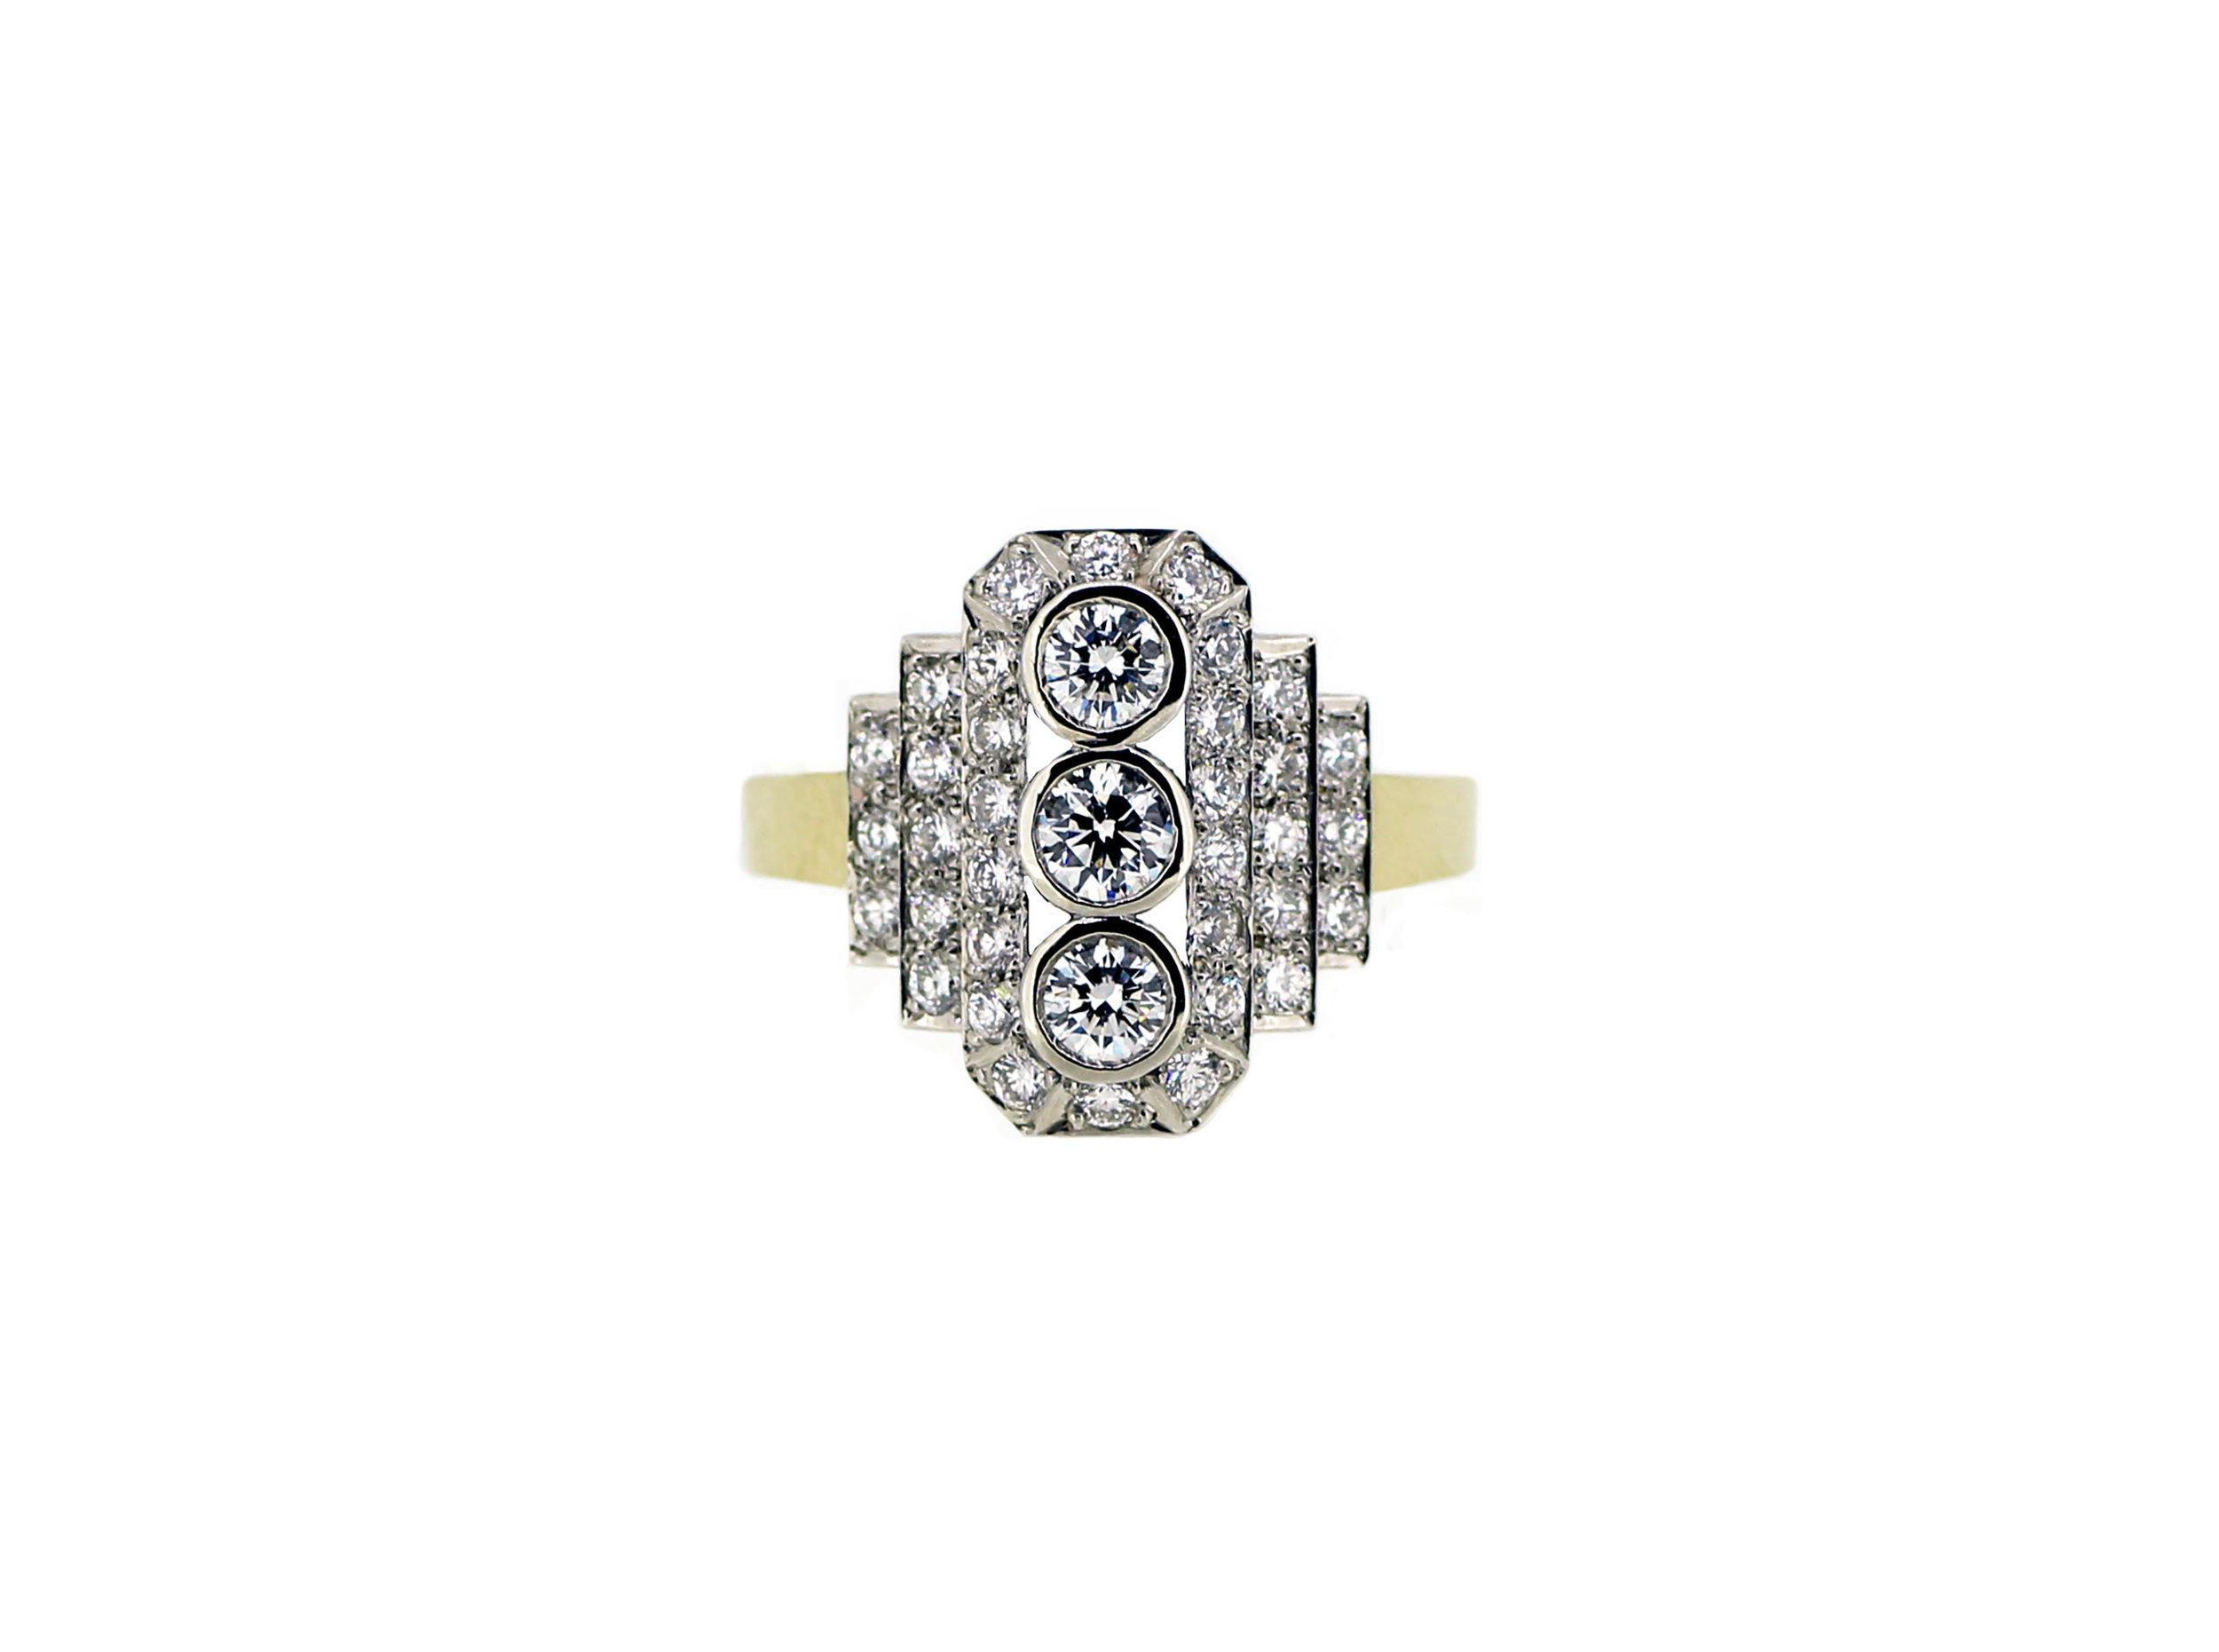 Bespoke Art Deco Diamond Ring